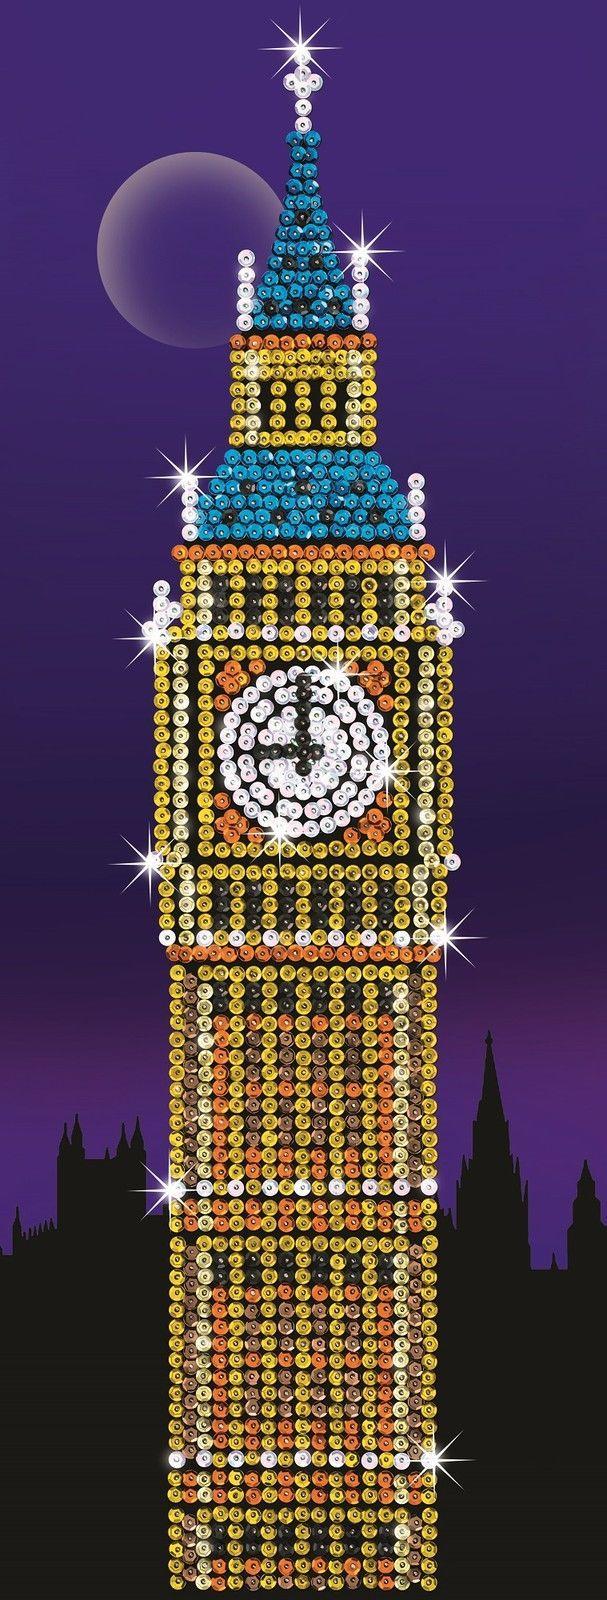 Strictly Sequin Art Big Ben Sparkling Craft Picture Kit